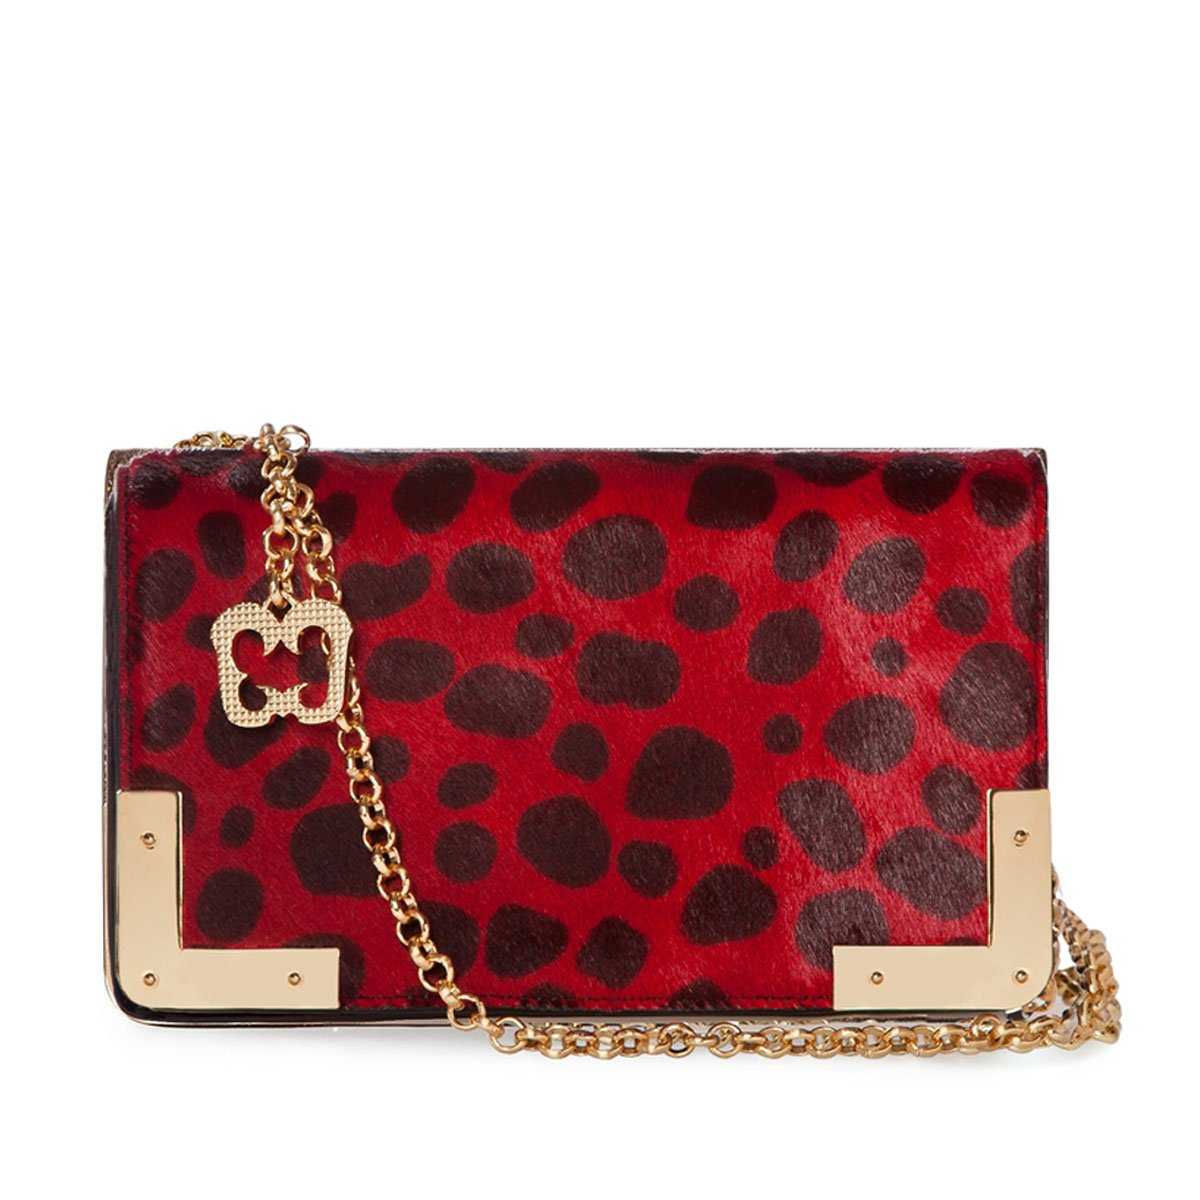 Eric Javits Luxury Fashion Designer Women's Handbag - Cassidy - Red Black